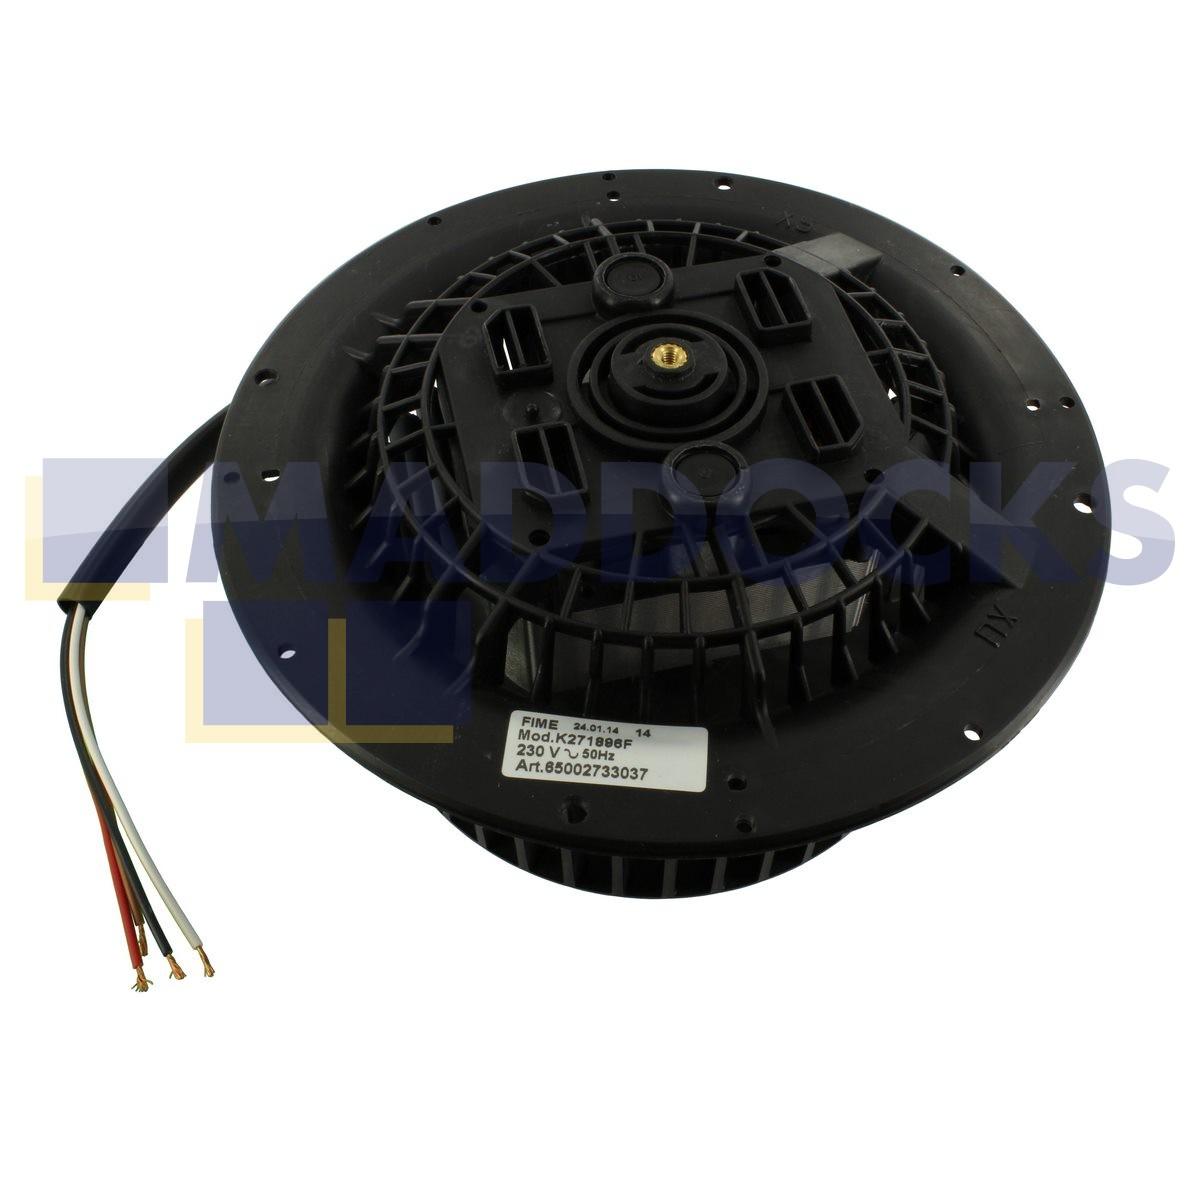 Genuine Original Universal K27rp1896 Type Fan Motor For